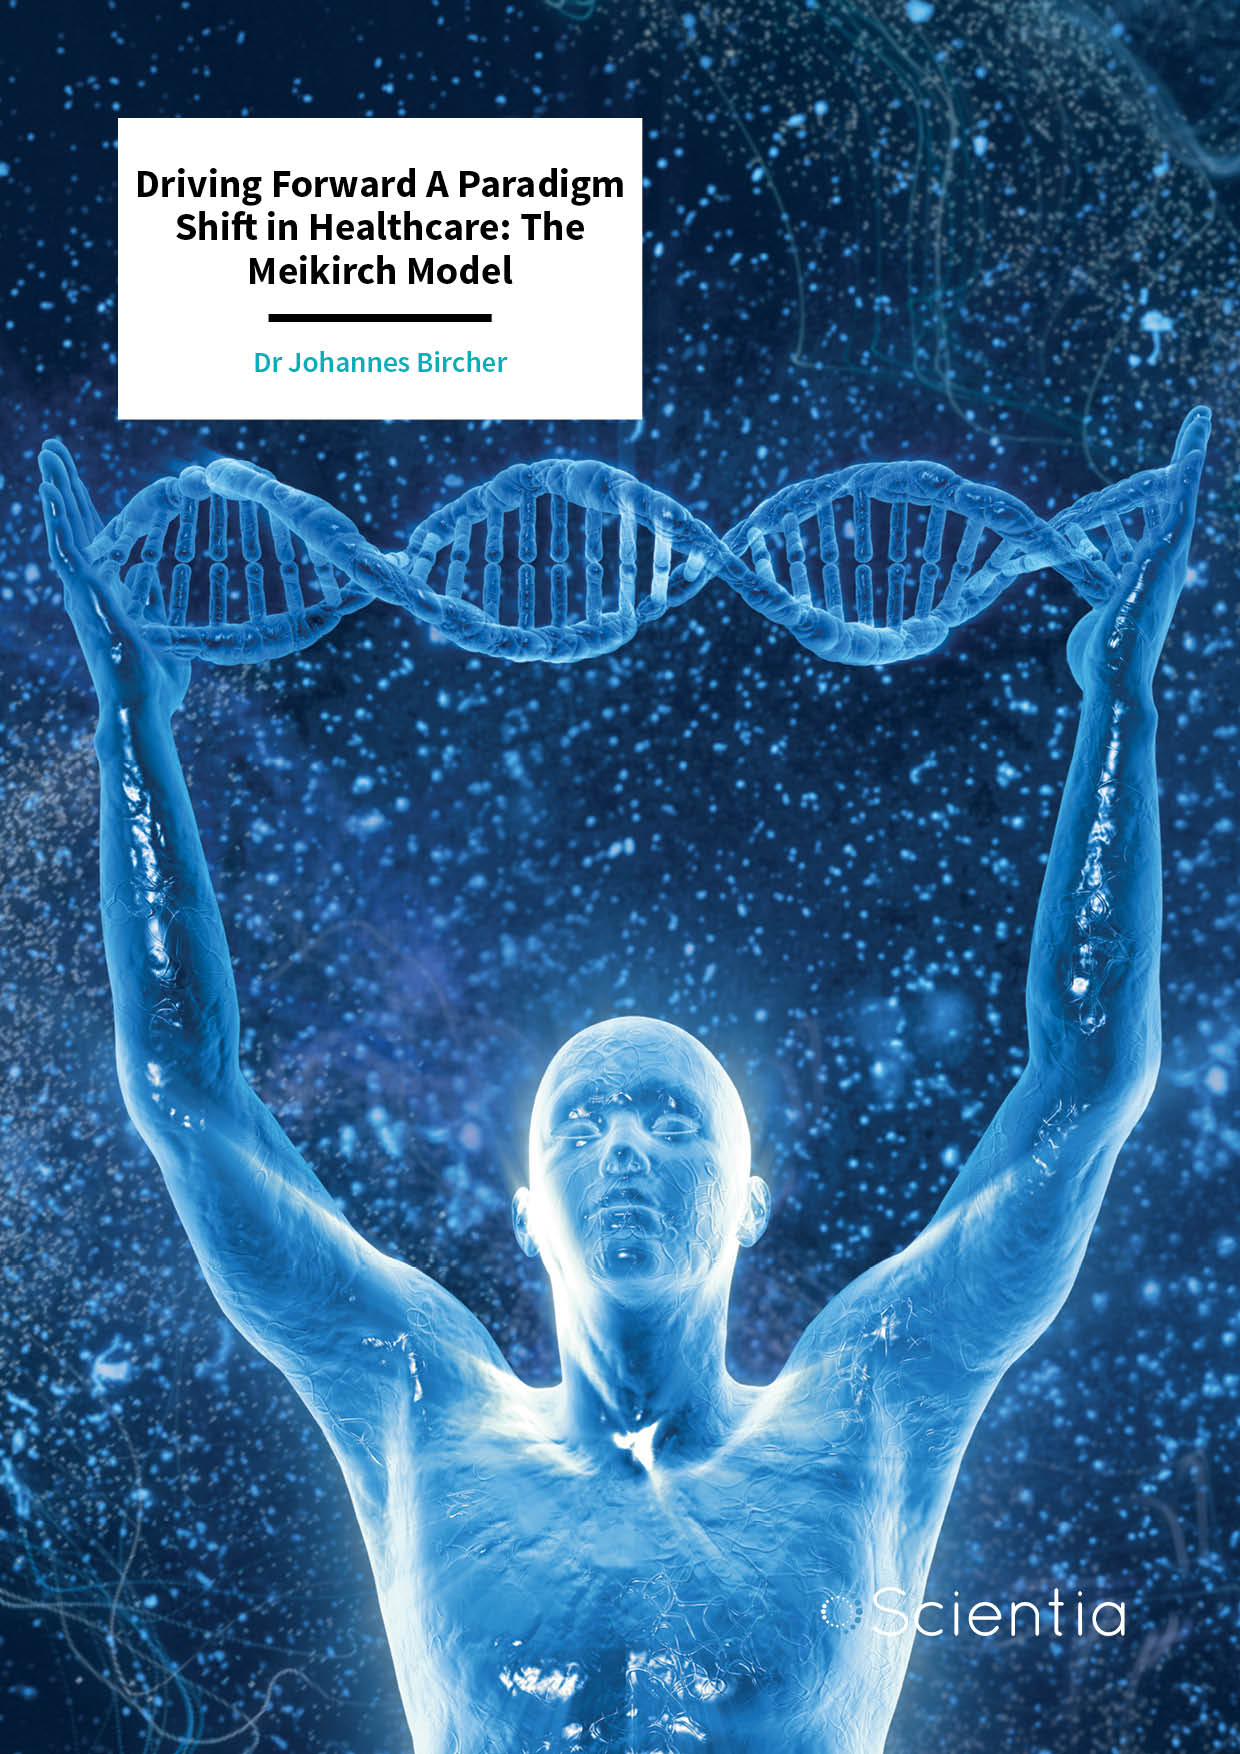 Dr Johannes Bircher – Driving Forward A Paradigm Shift in Healthcare: The Meikirch Model